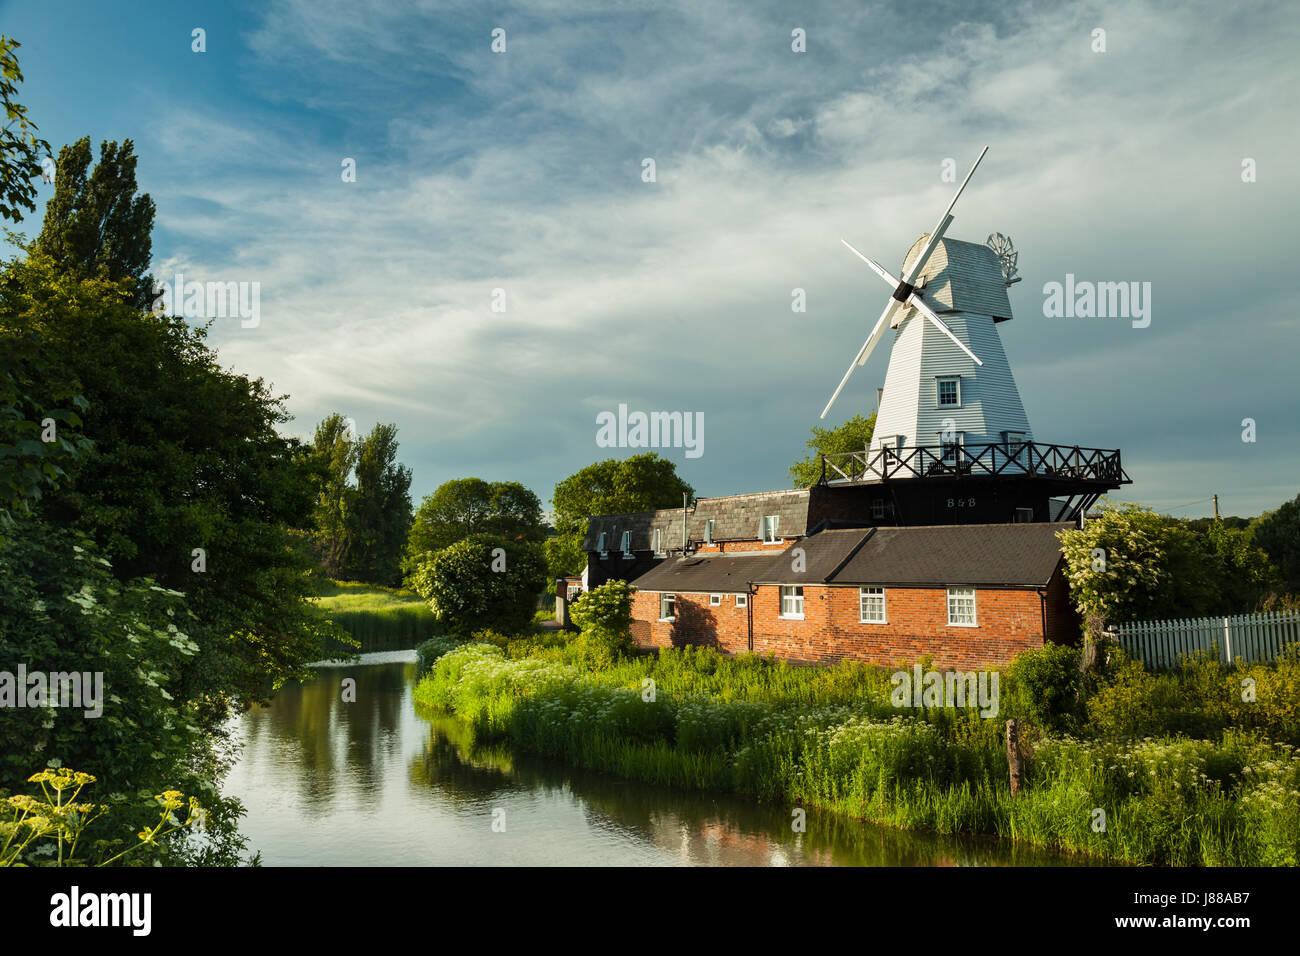 Frühling-Nachmittag am Galgen Mühle in Rye, East Sussex, England. Stockbild